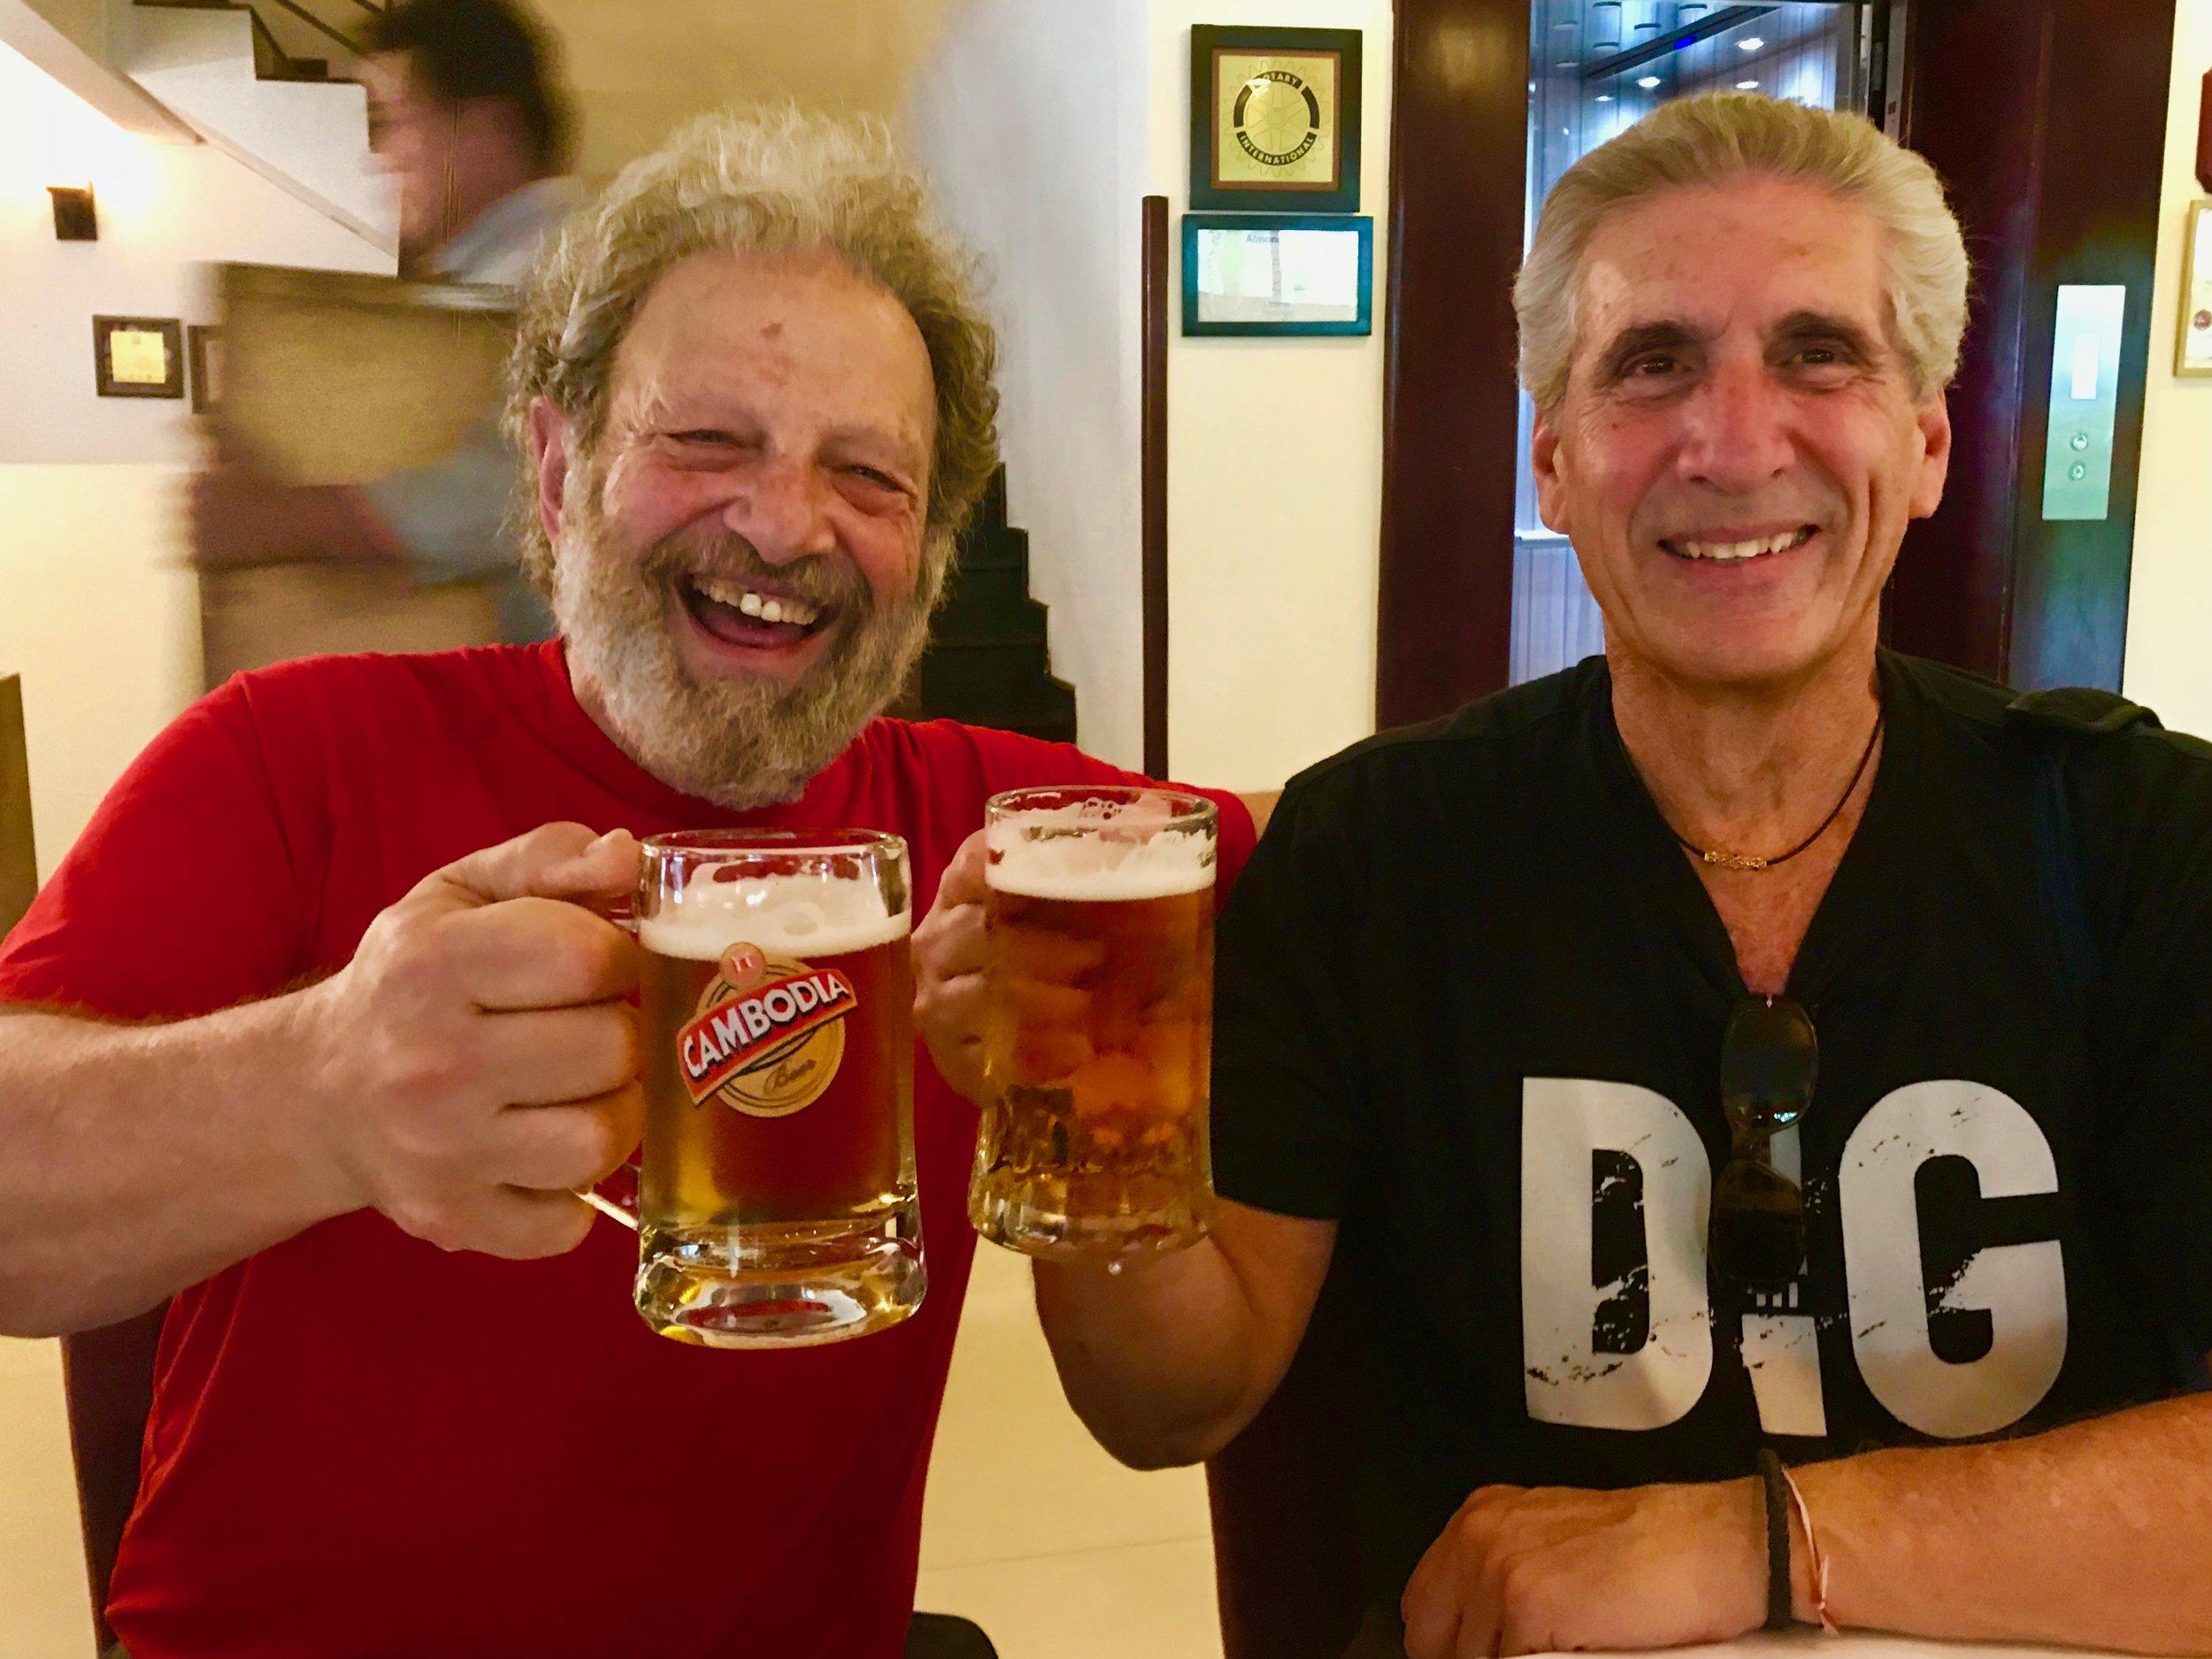 Jerry & Me Toasting w beer mug Cambodia.jpg